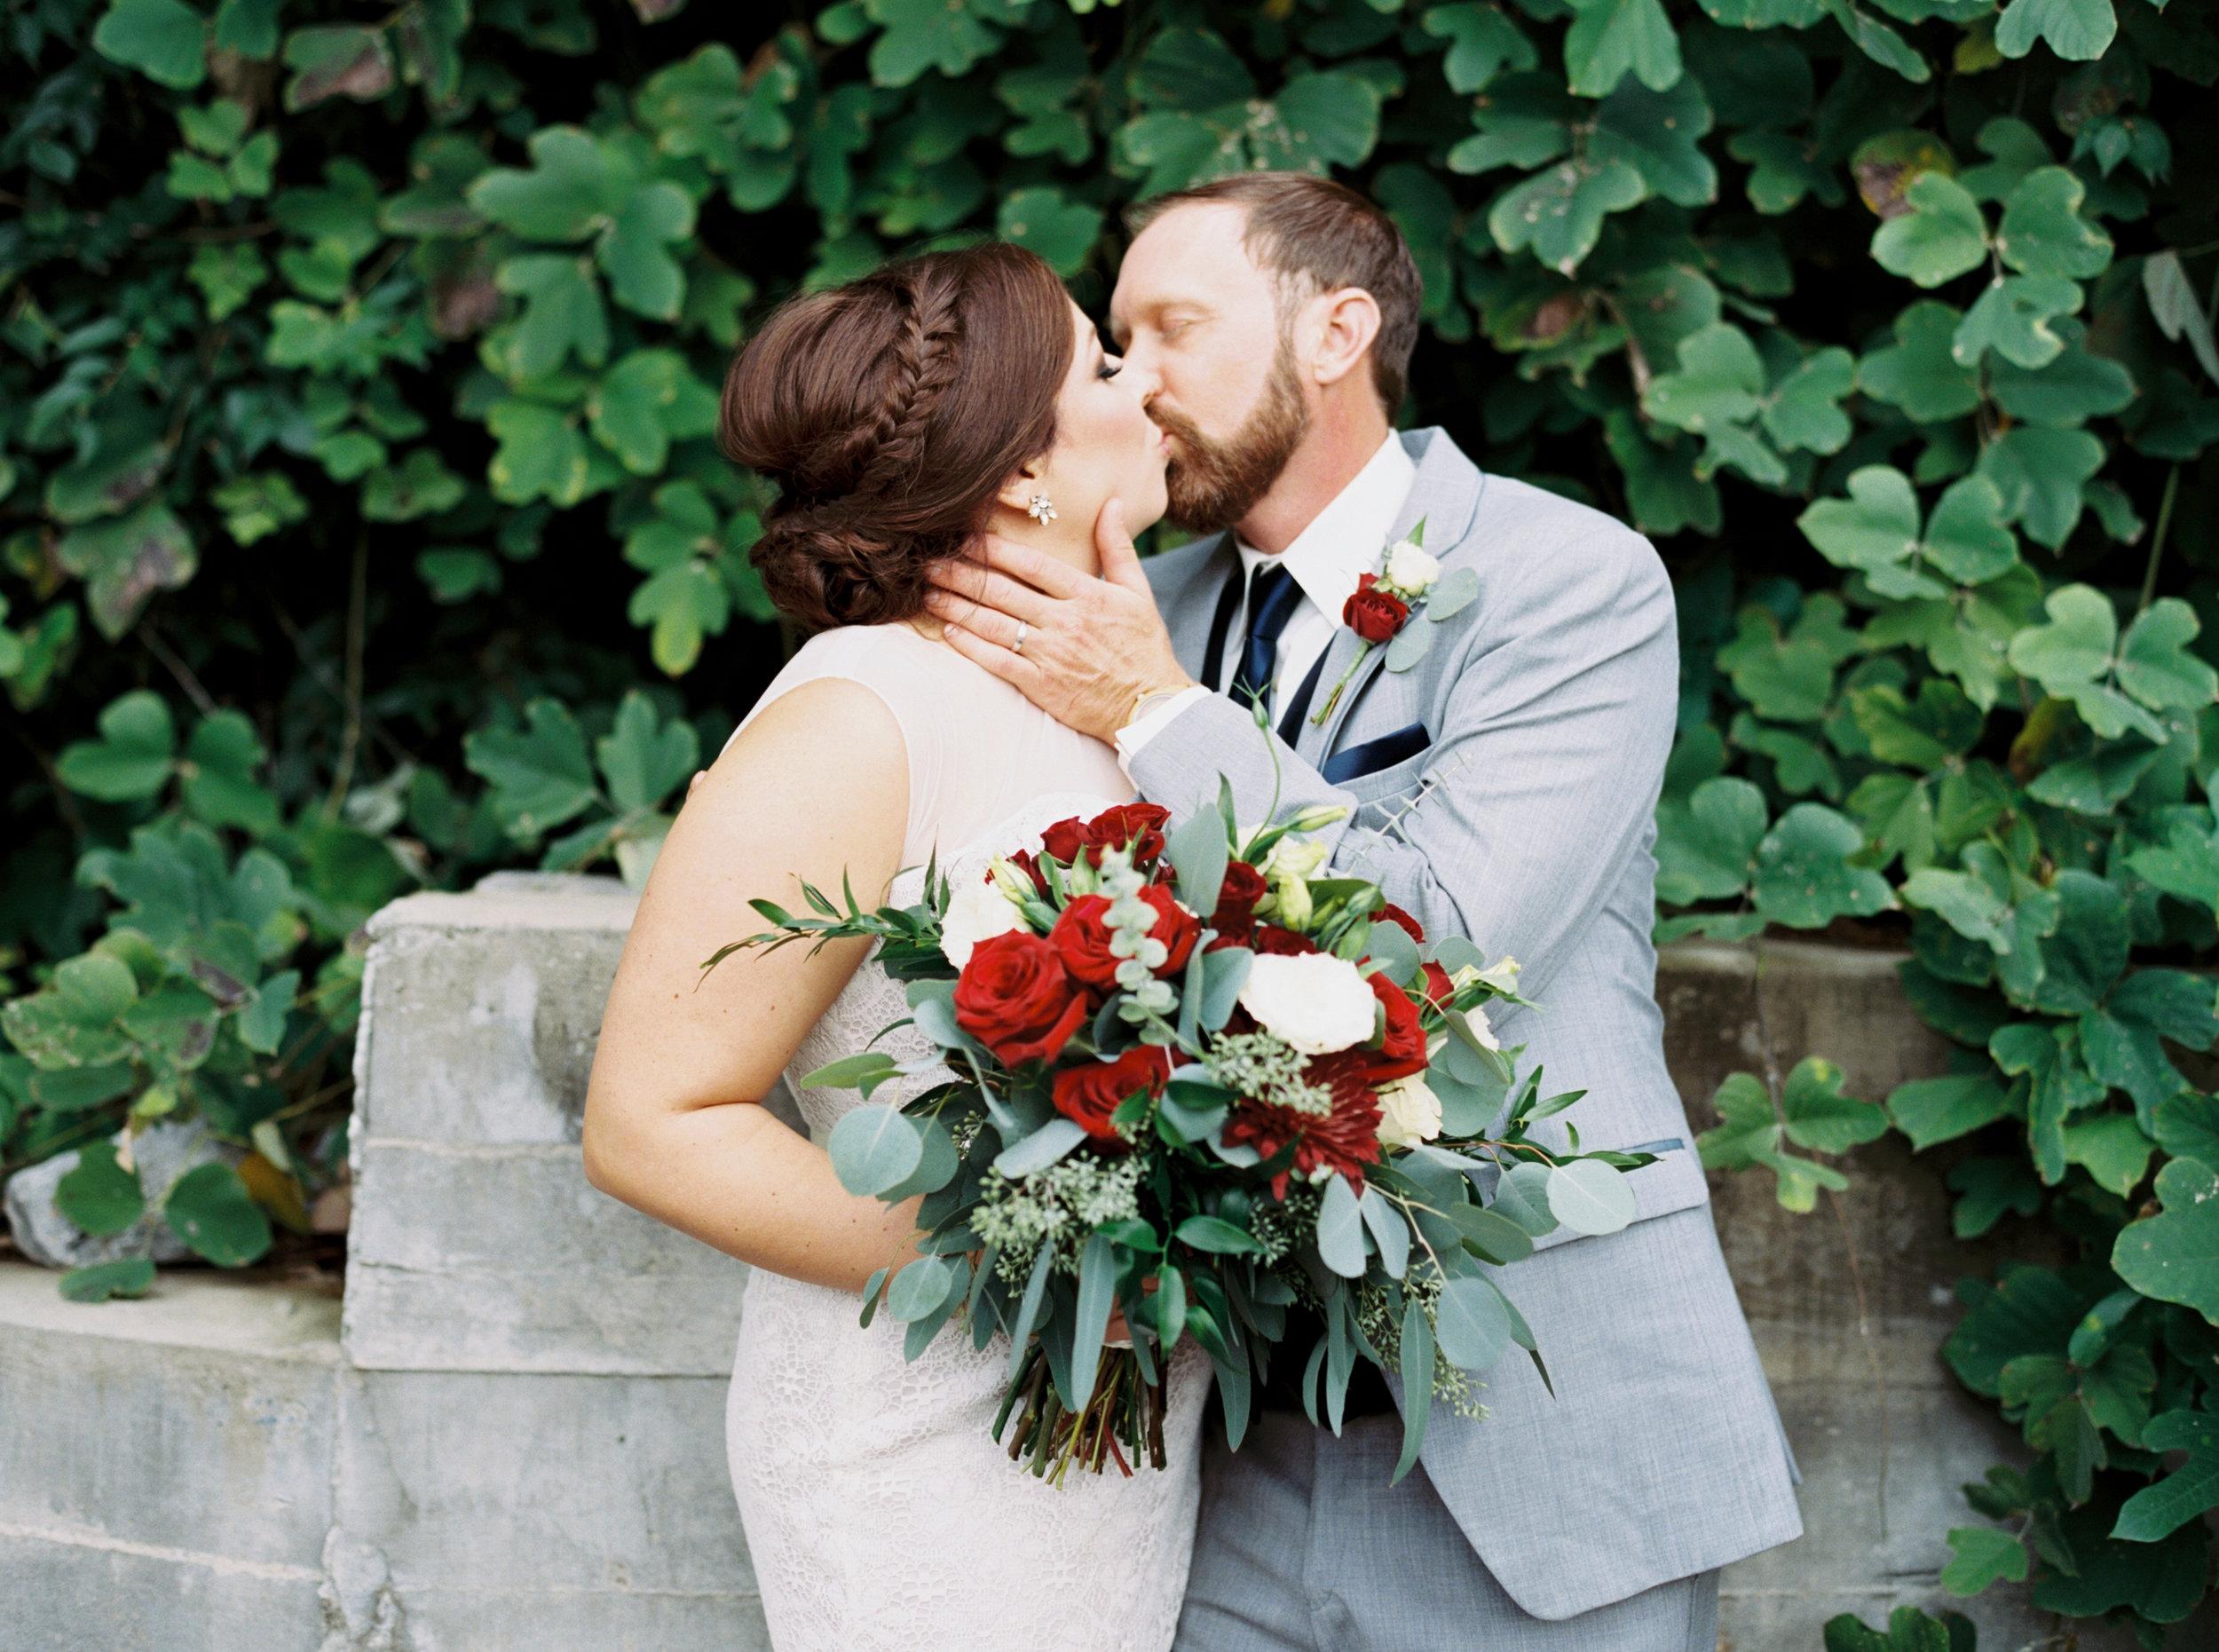 Jessica_Bryan_Wedding_Standard_Knoxville_Abigail_Malone_Photography-245.jpg